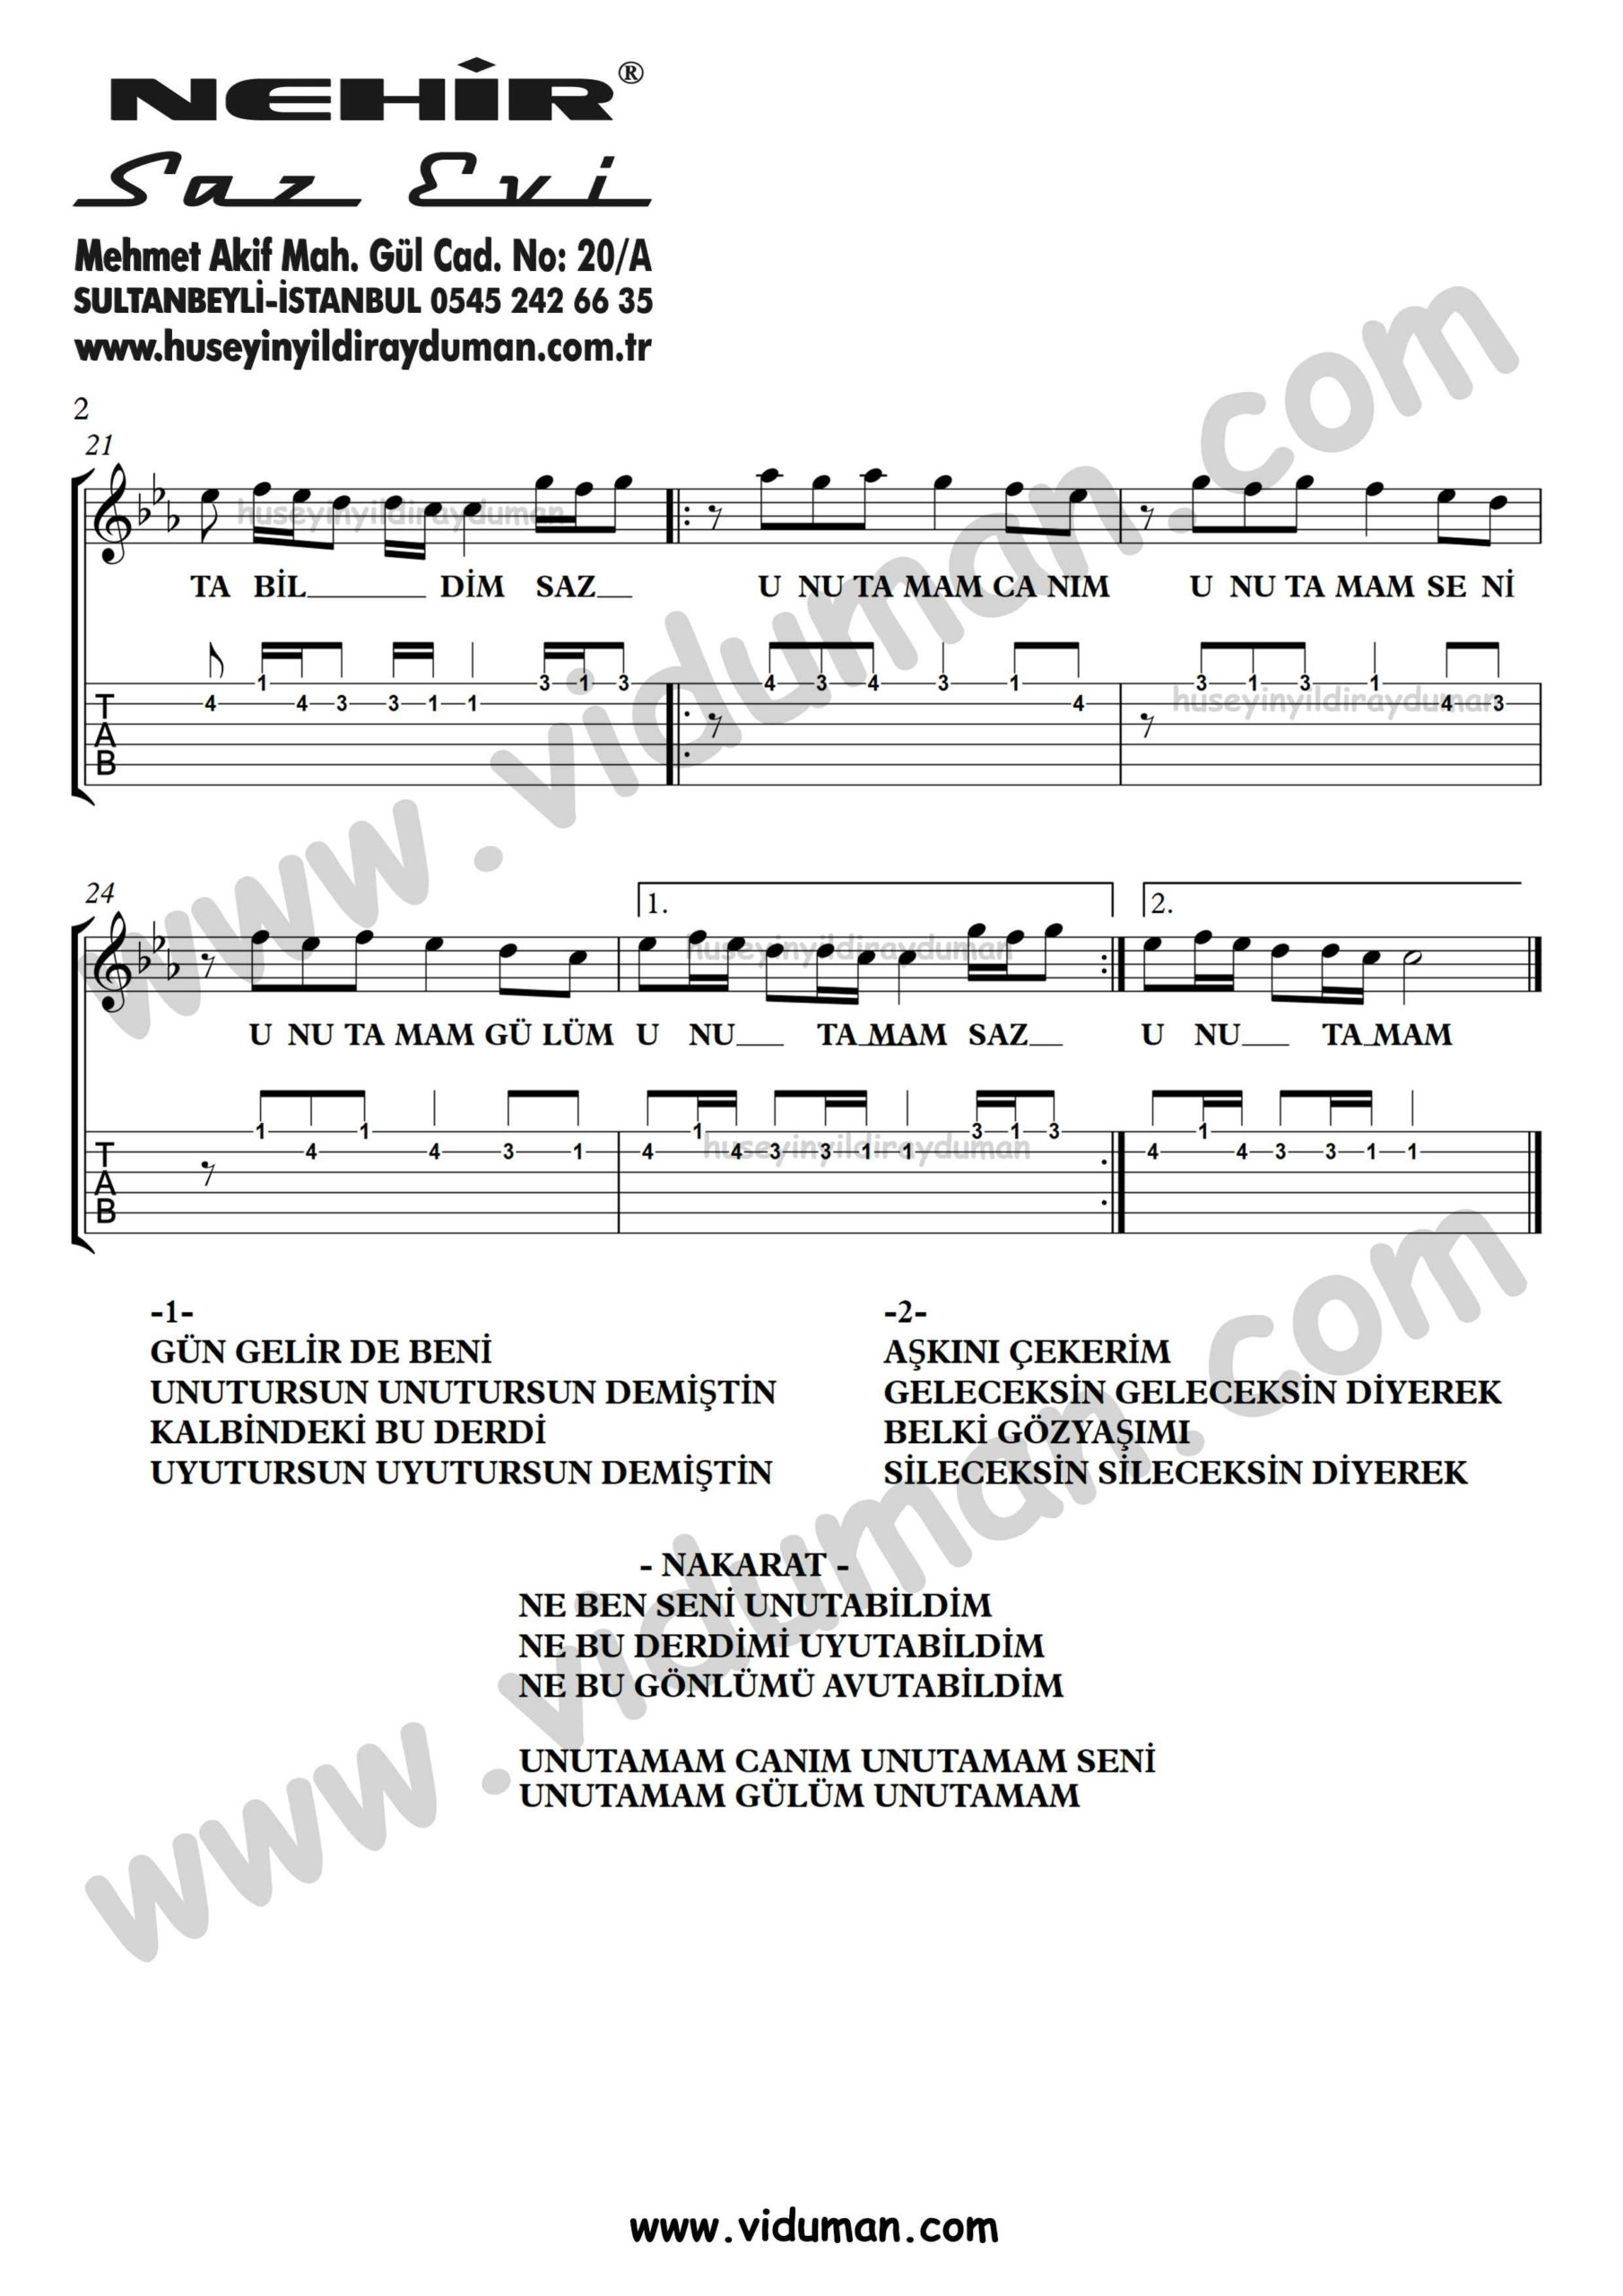 Unutamam Seni_2-Ahmet Kaya-Gitar Tab-Solo Notalari